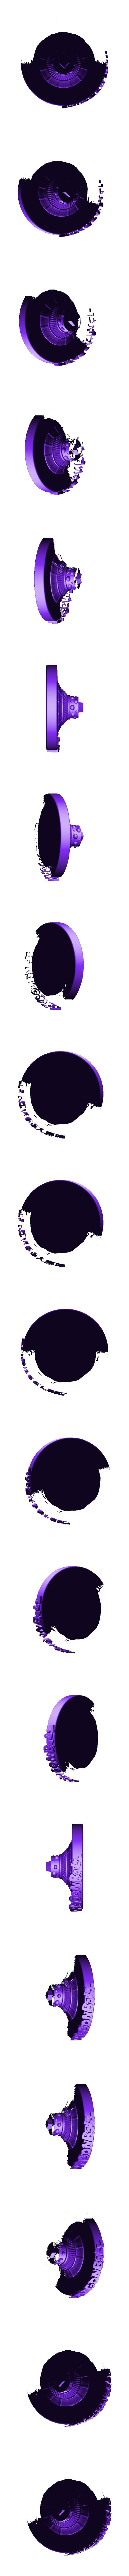 beerus2.stl Download free STL file Beerus Bust Model • Design to 3D print, lmhoangptit